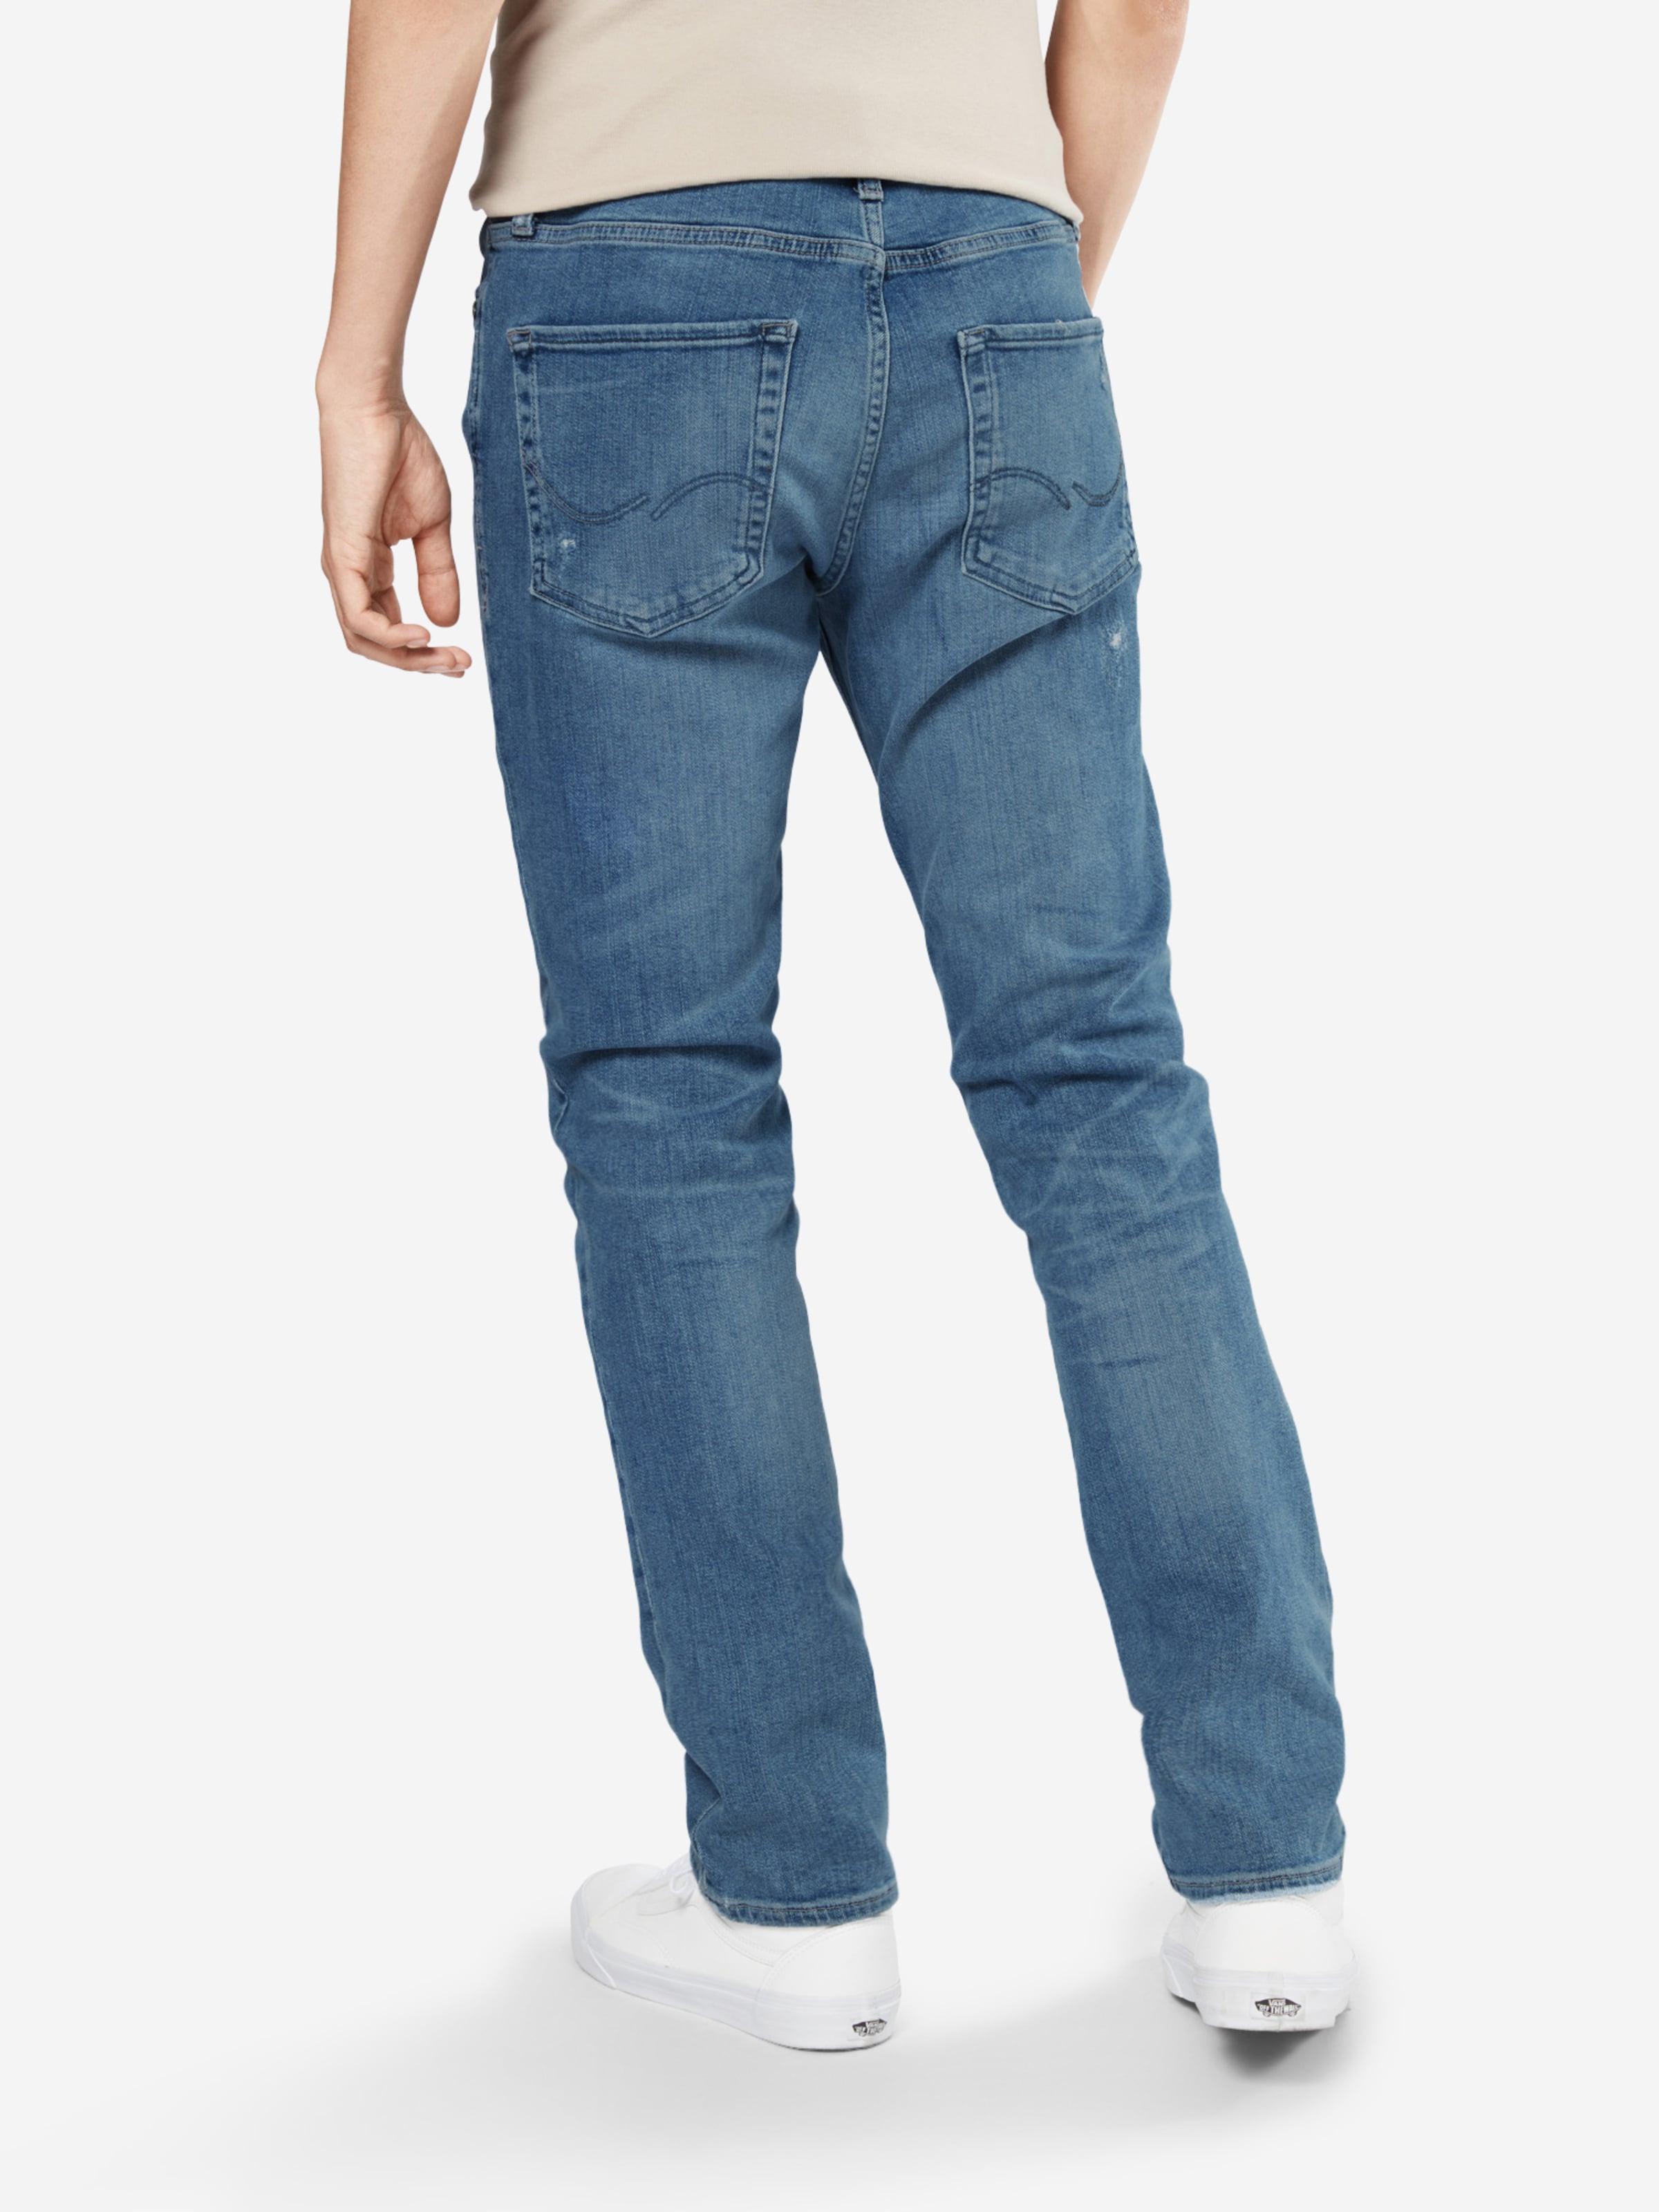 Günstig Kaufen Besuch Neu JACK & JONES Jeans 'JJITIM JJORIGINAL JJ 177' Wahl Günstiger Preis mvJFv1